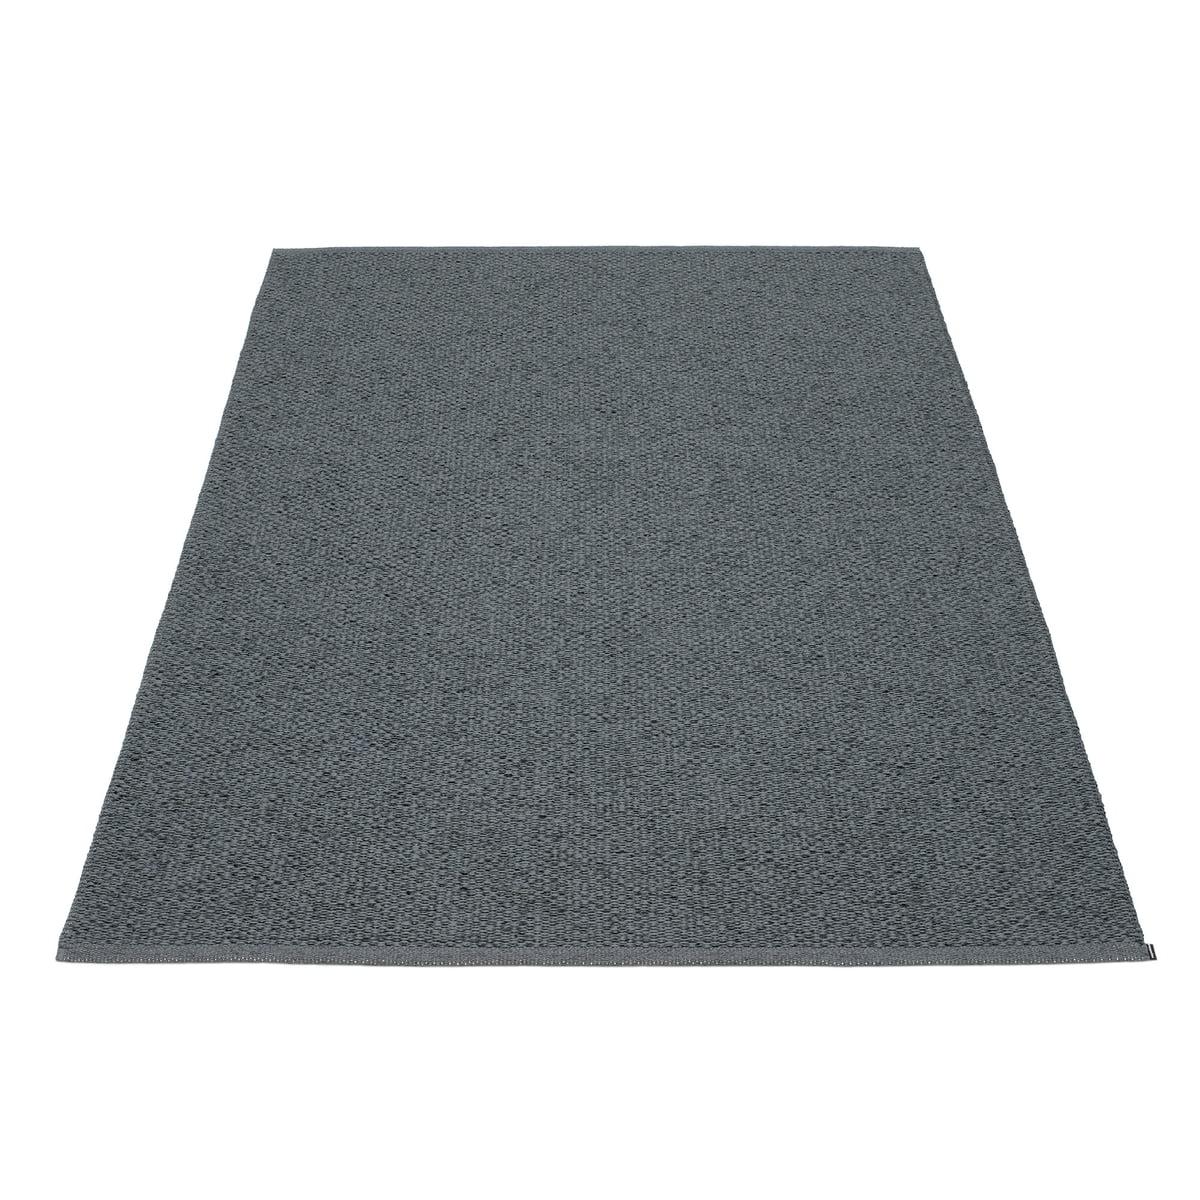 pappelina svea teppich 140 x 220 cm granit black metallic granitgrau t 140 h 0 b 220. Black Bedroom Furniture Sets. Home Design Ideas